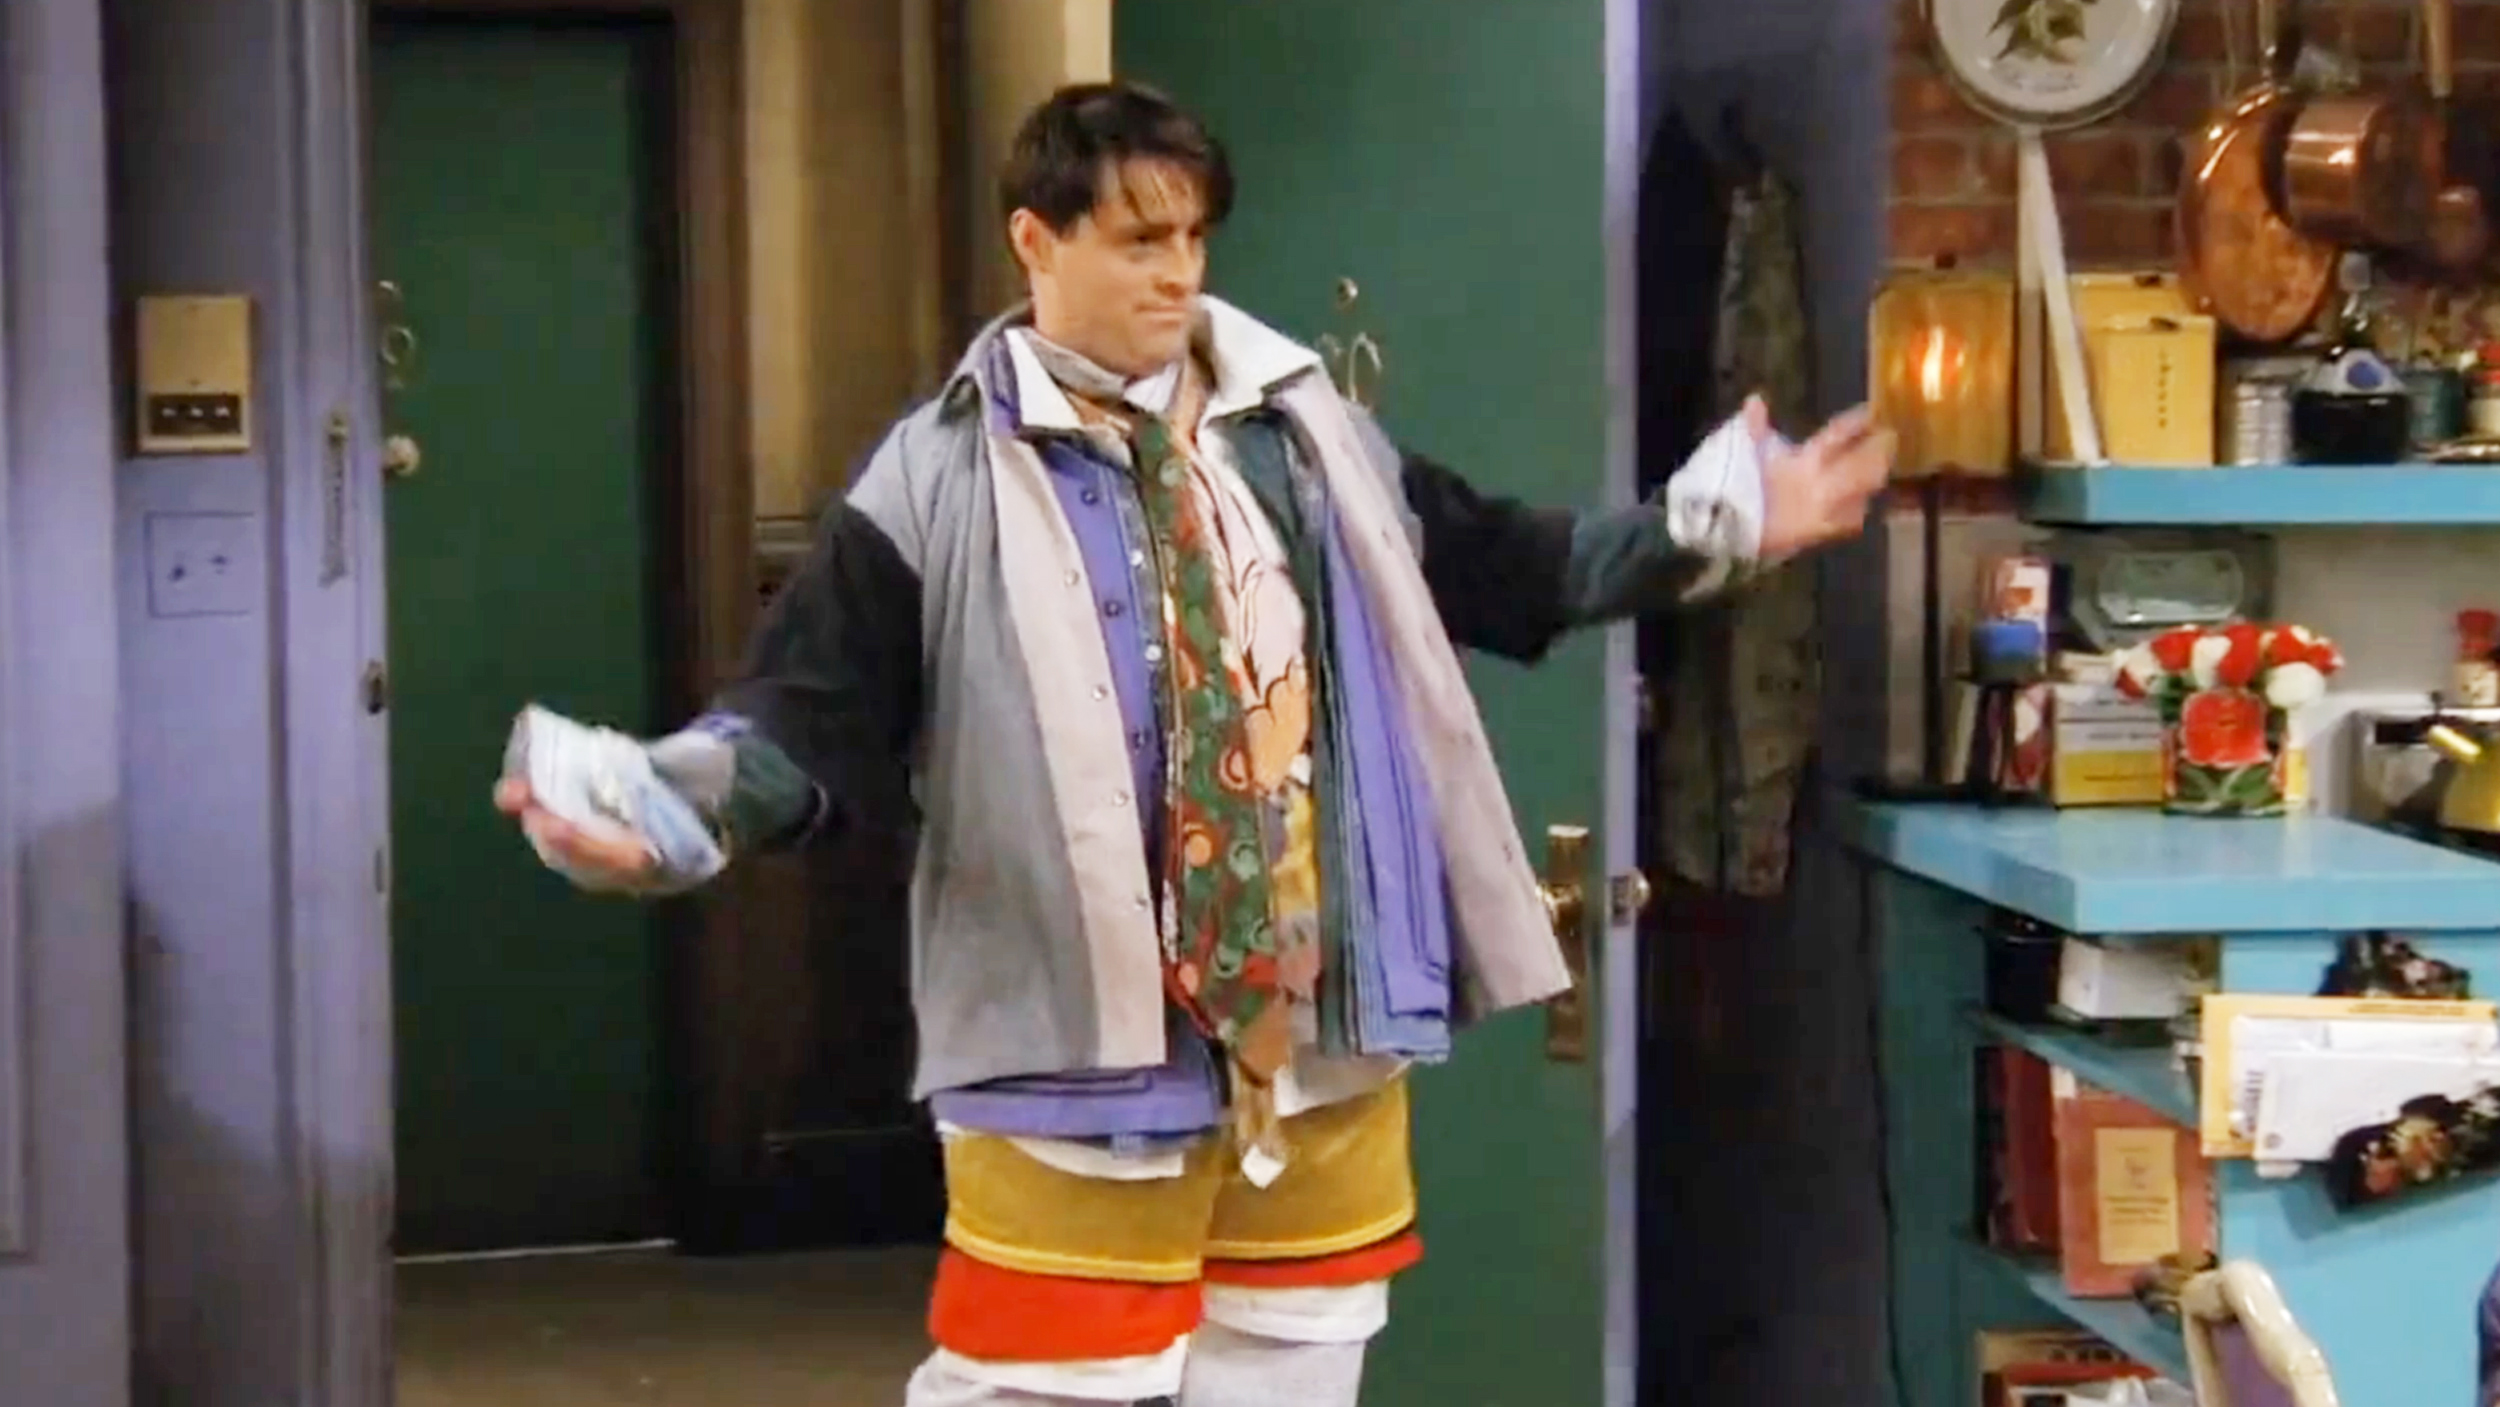 joey-chandler-clothes-today-160810-tease-02_183e8bbb94f24fb88589b02d9c511d03.jpg